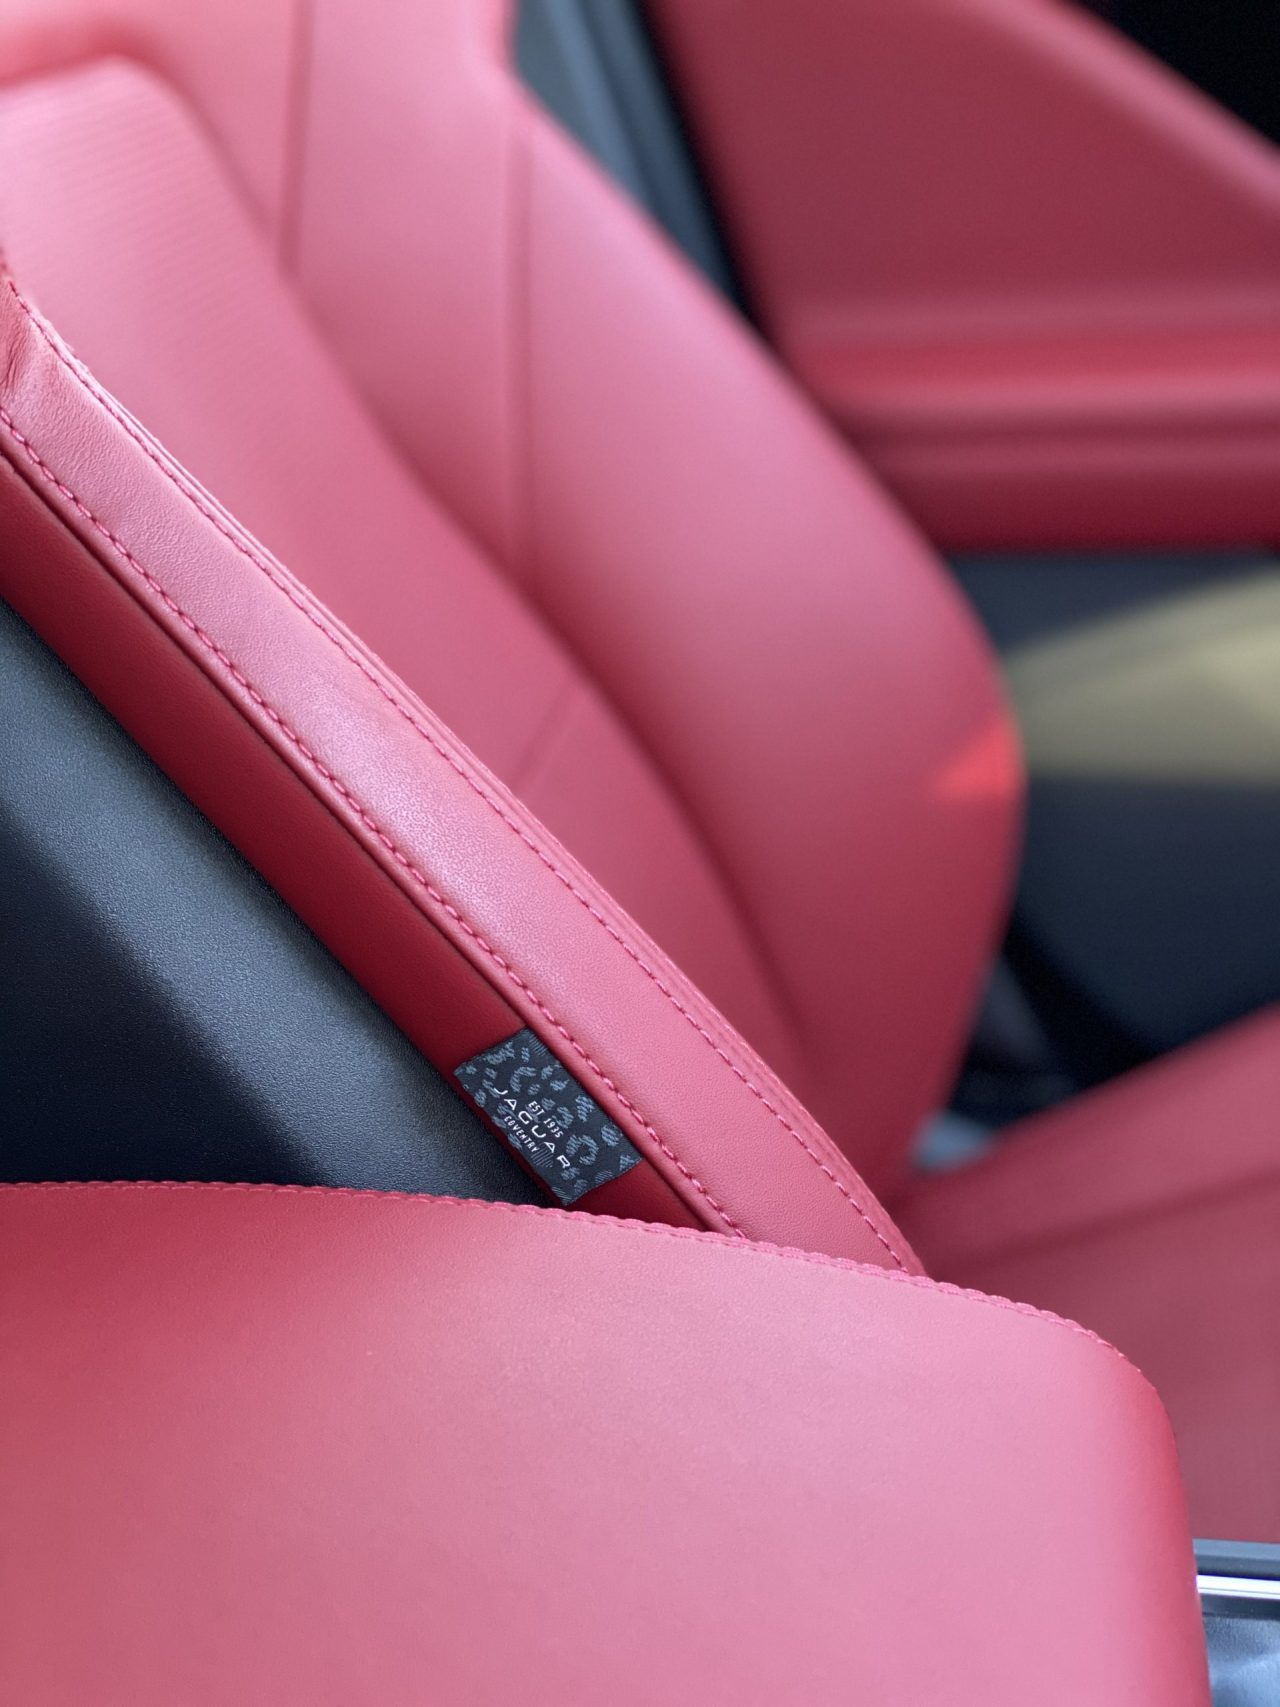 2020 Jaguar I-Pace red seats